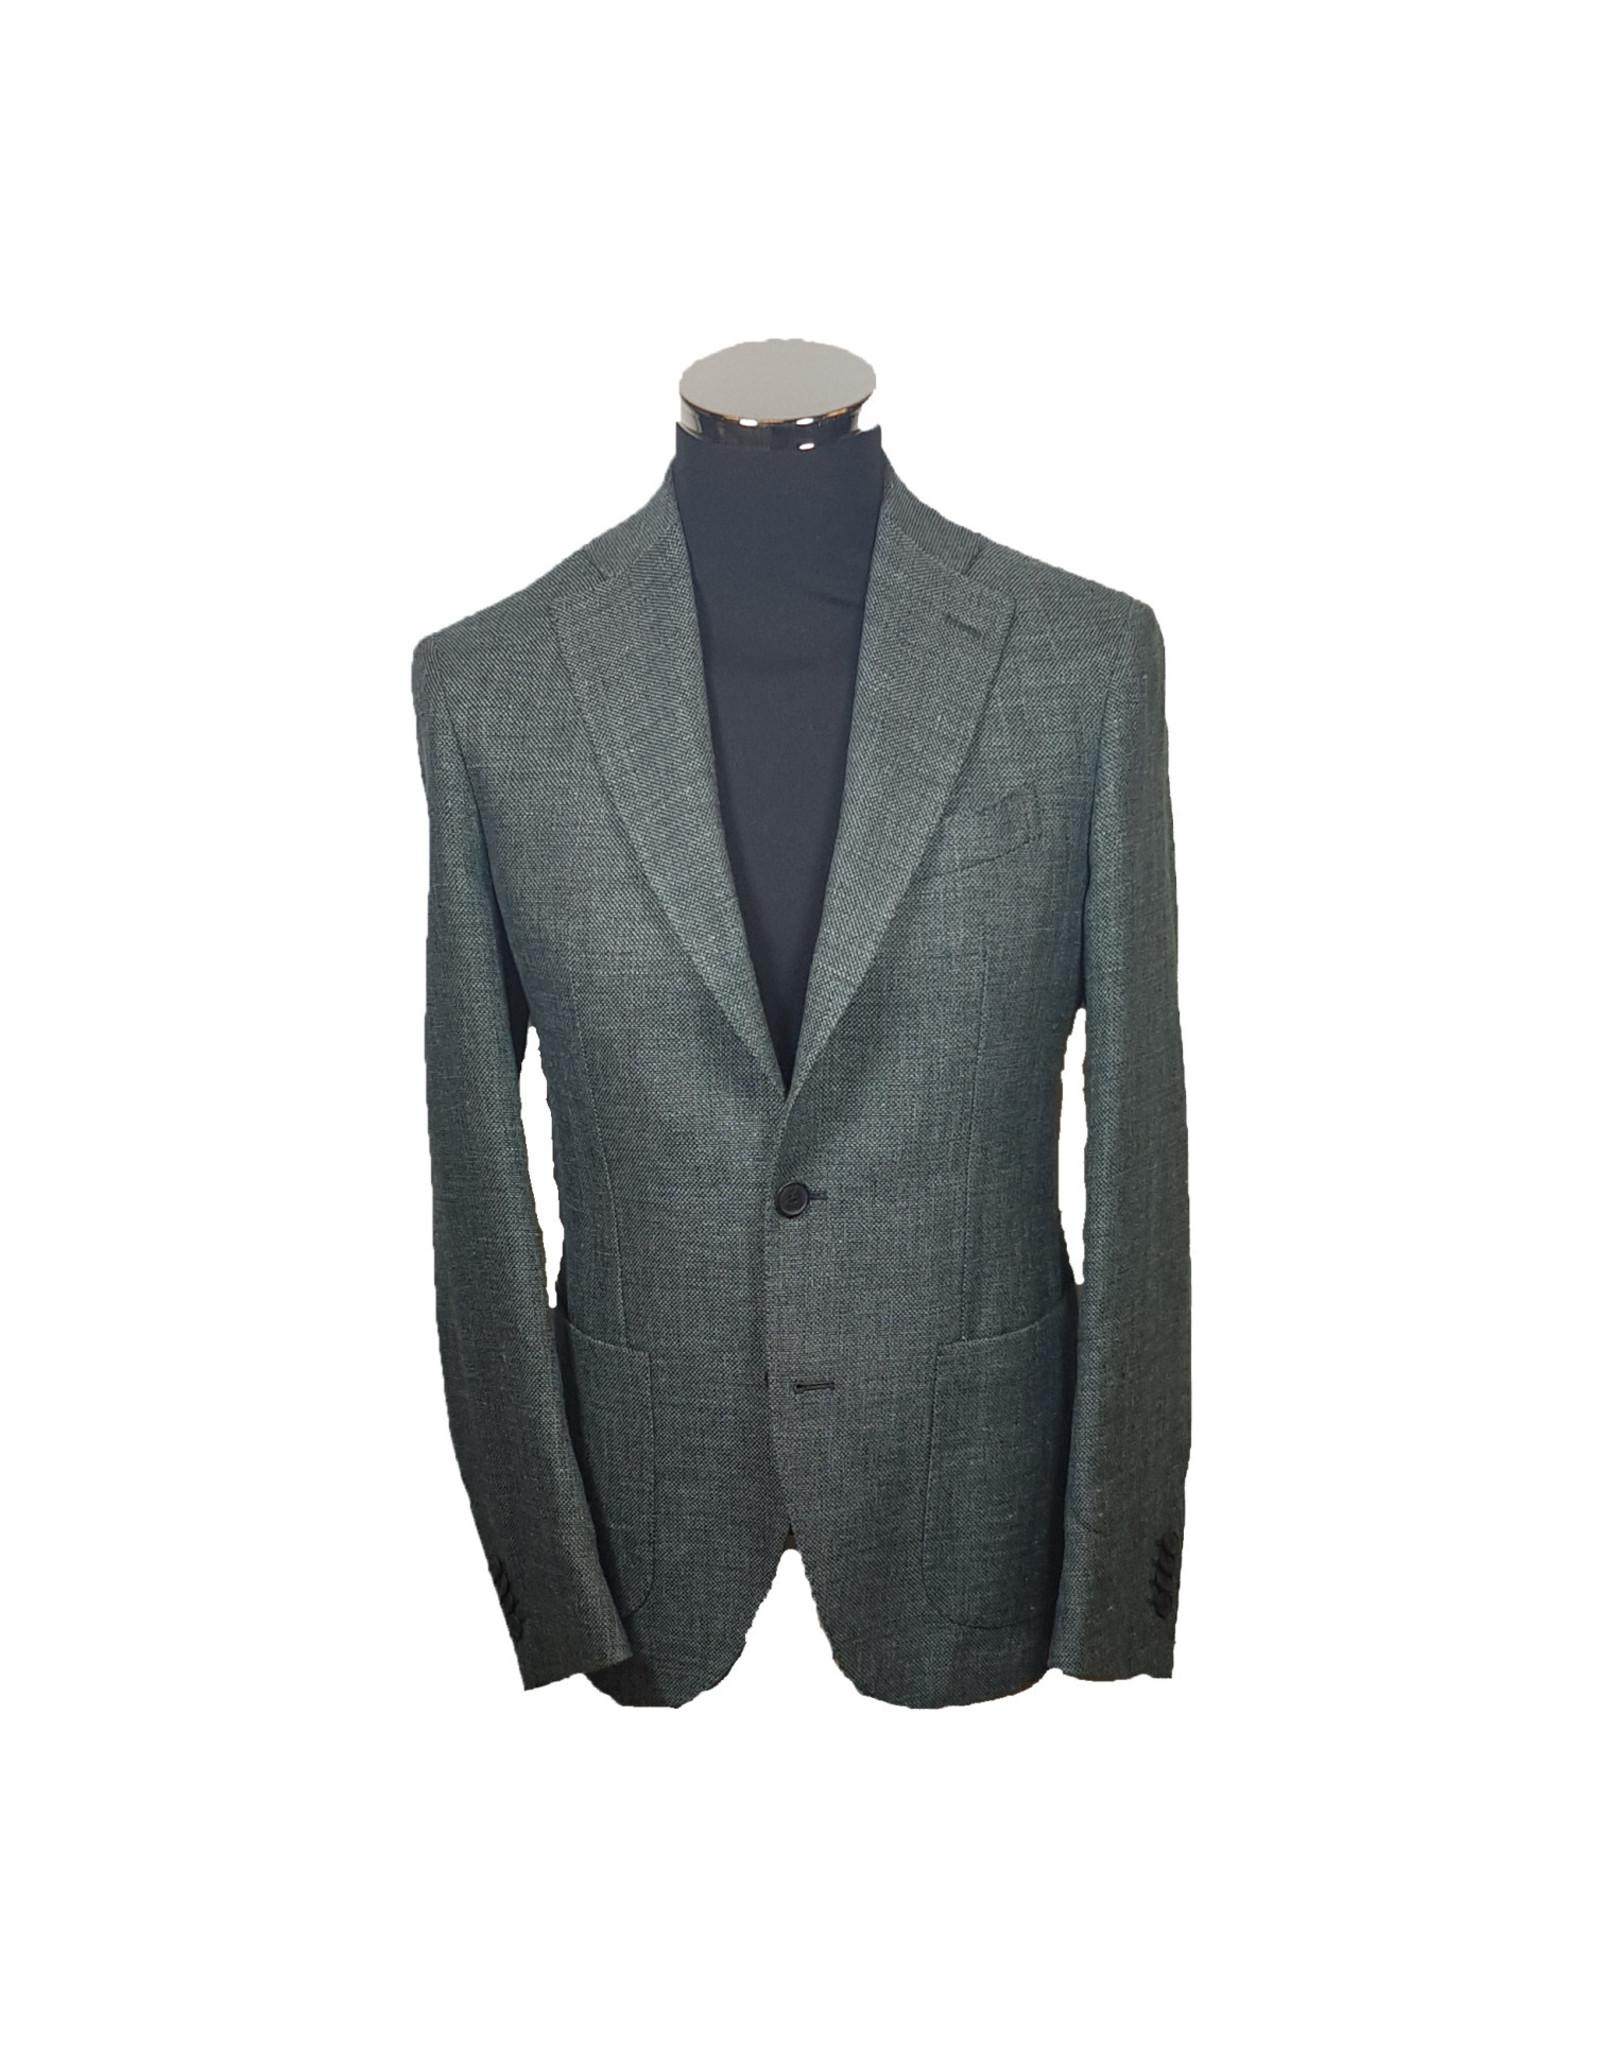 Latorre Gabiati vest groen U70244/3